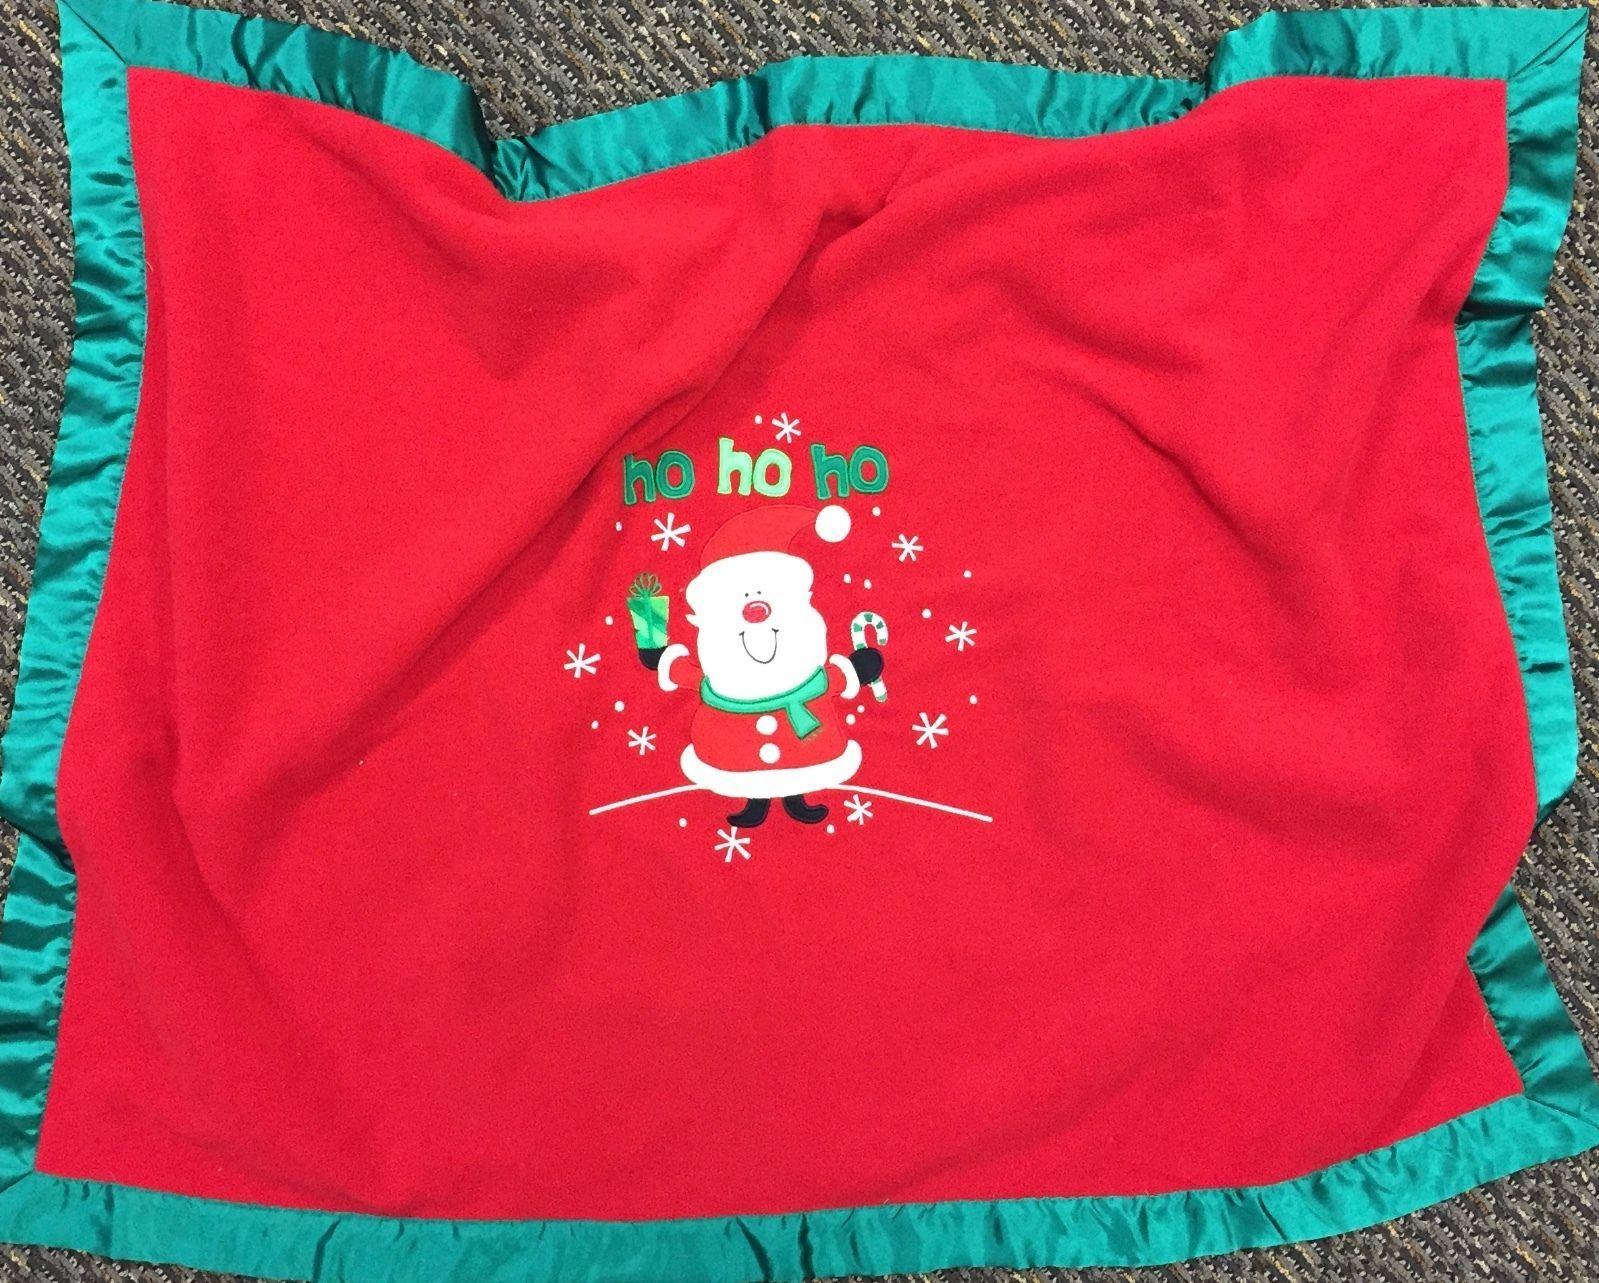 df5c5ab2c Koala Baby - Christmas Santa Blanket - Red and similar items. 57